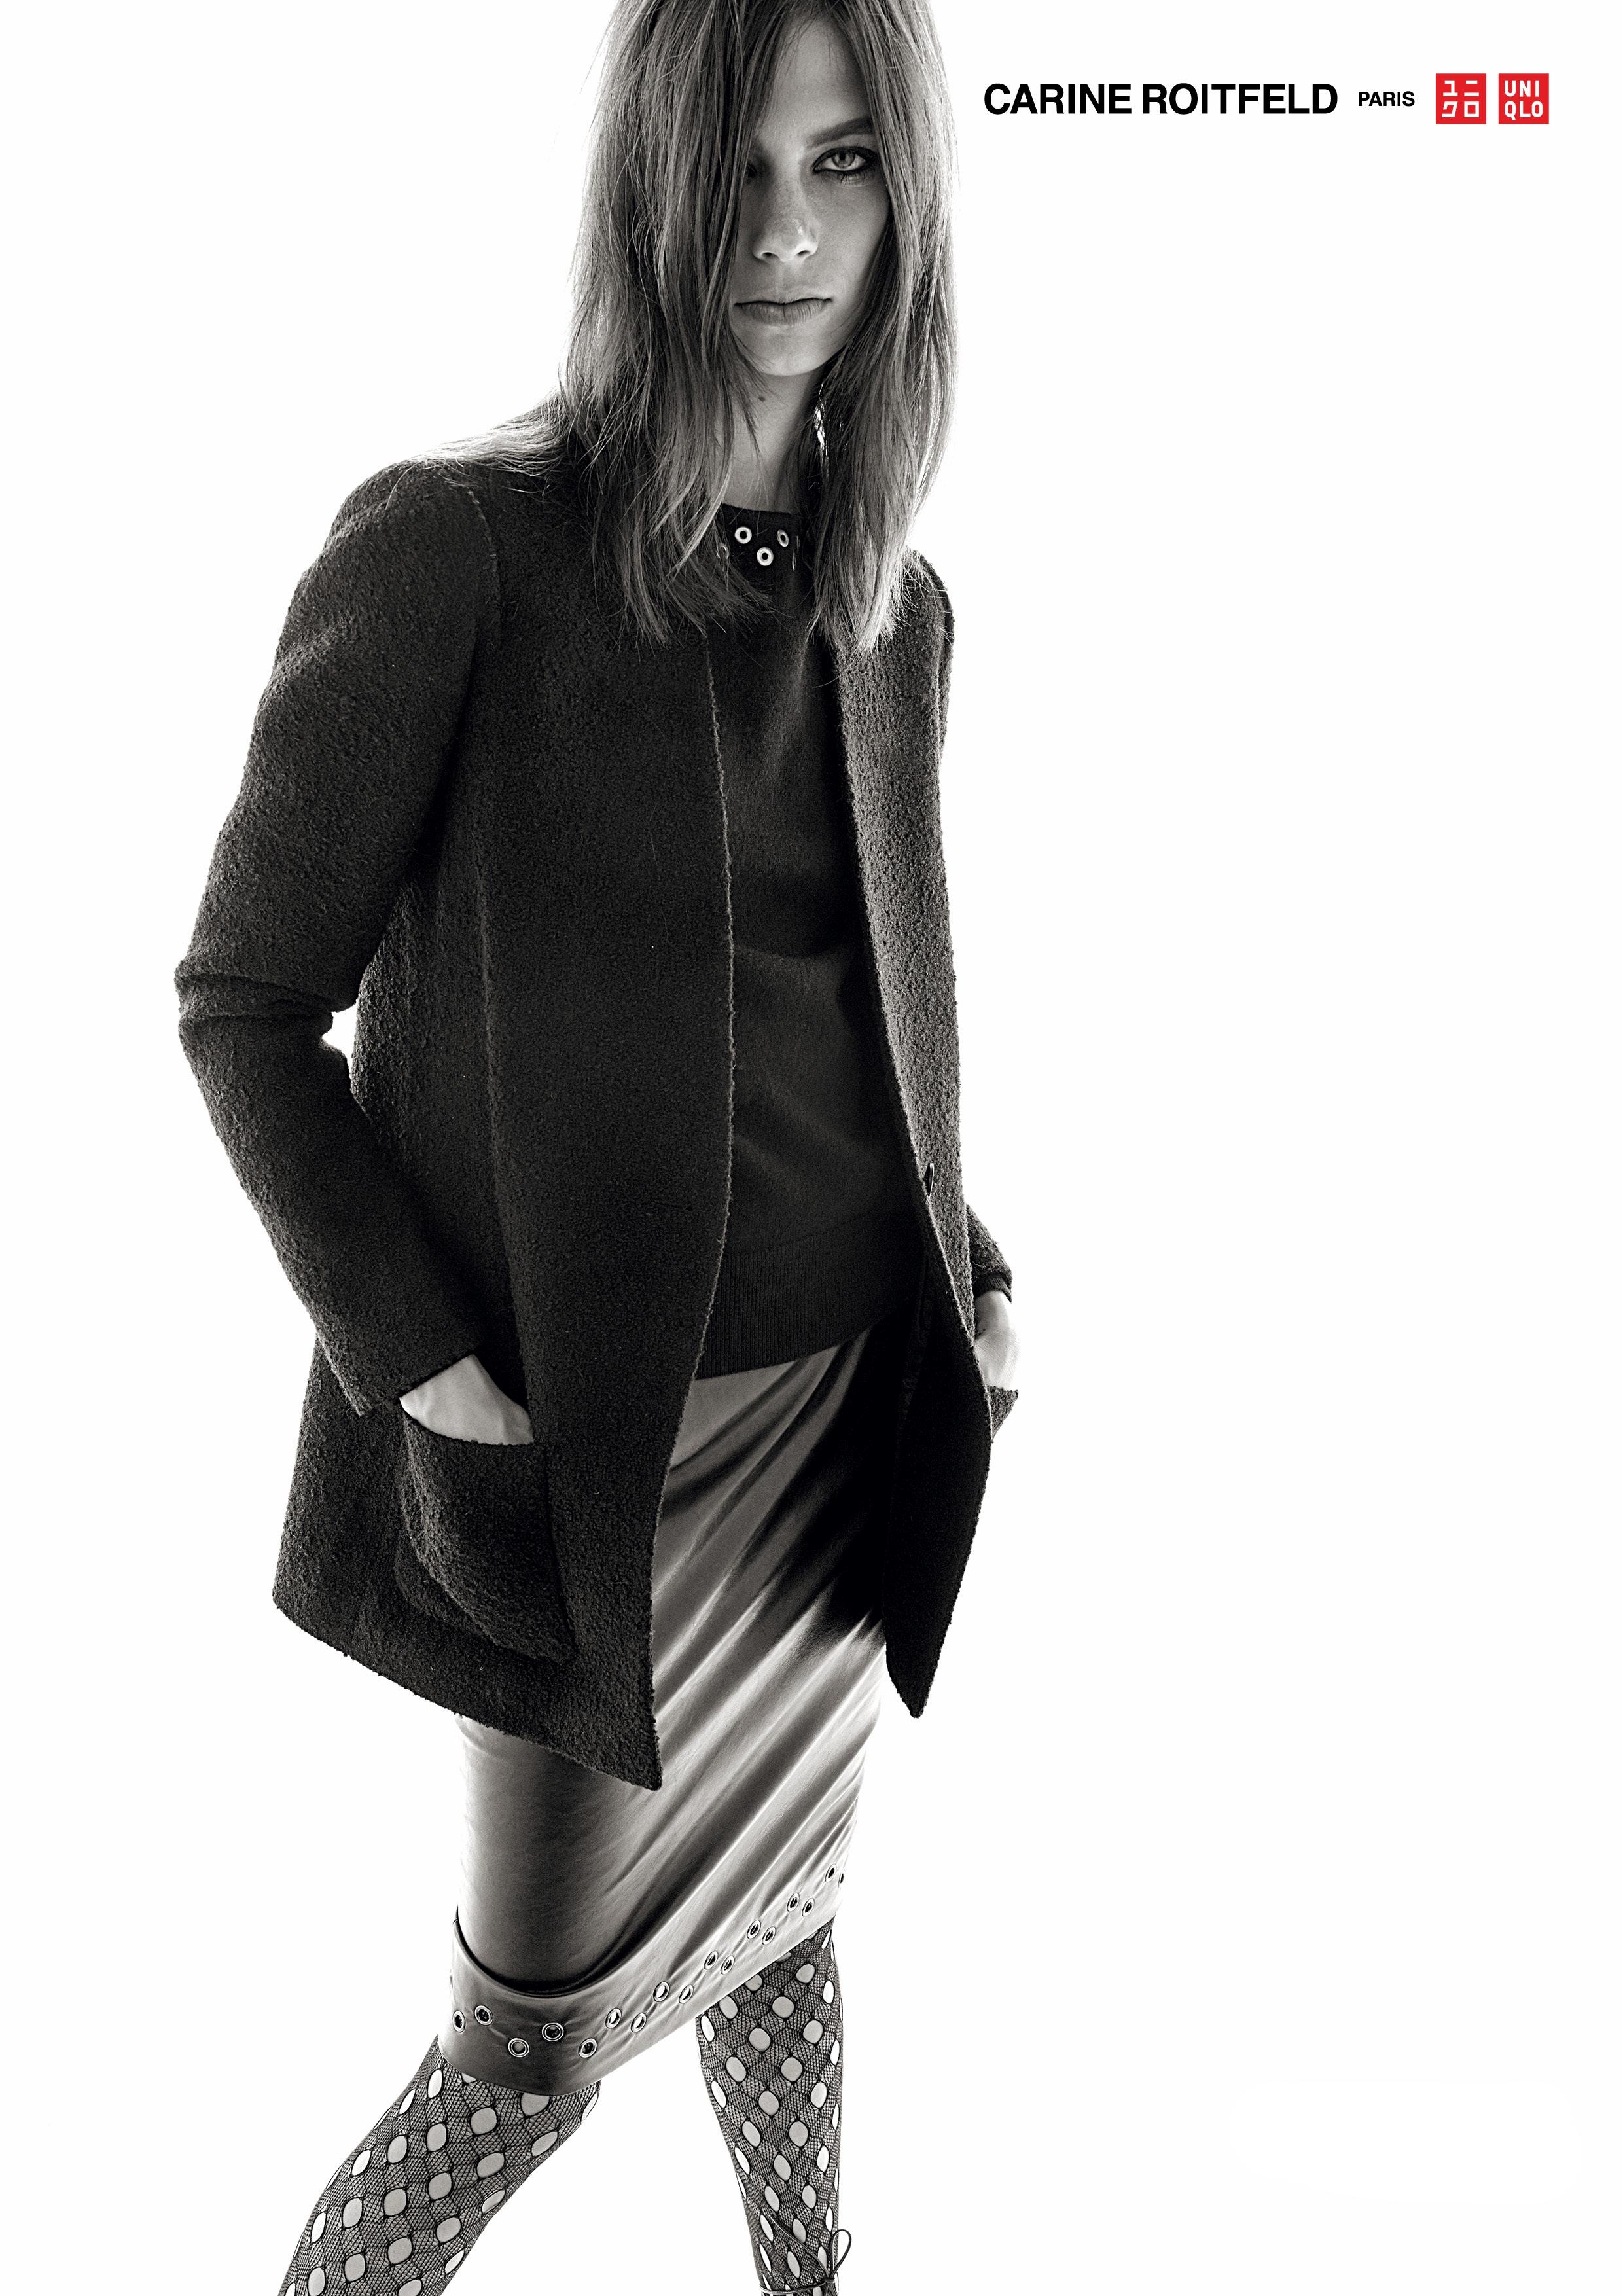 #uniqlo #carineroitfeld #stevenmeisel #fw15 #fashion #campaign #lexiboling #jimkaemmerling #patmcgrath #guidopalau